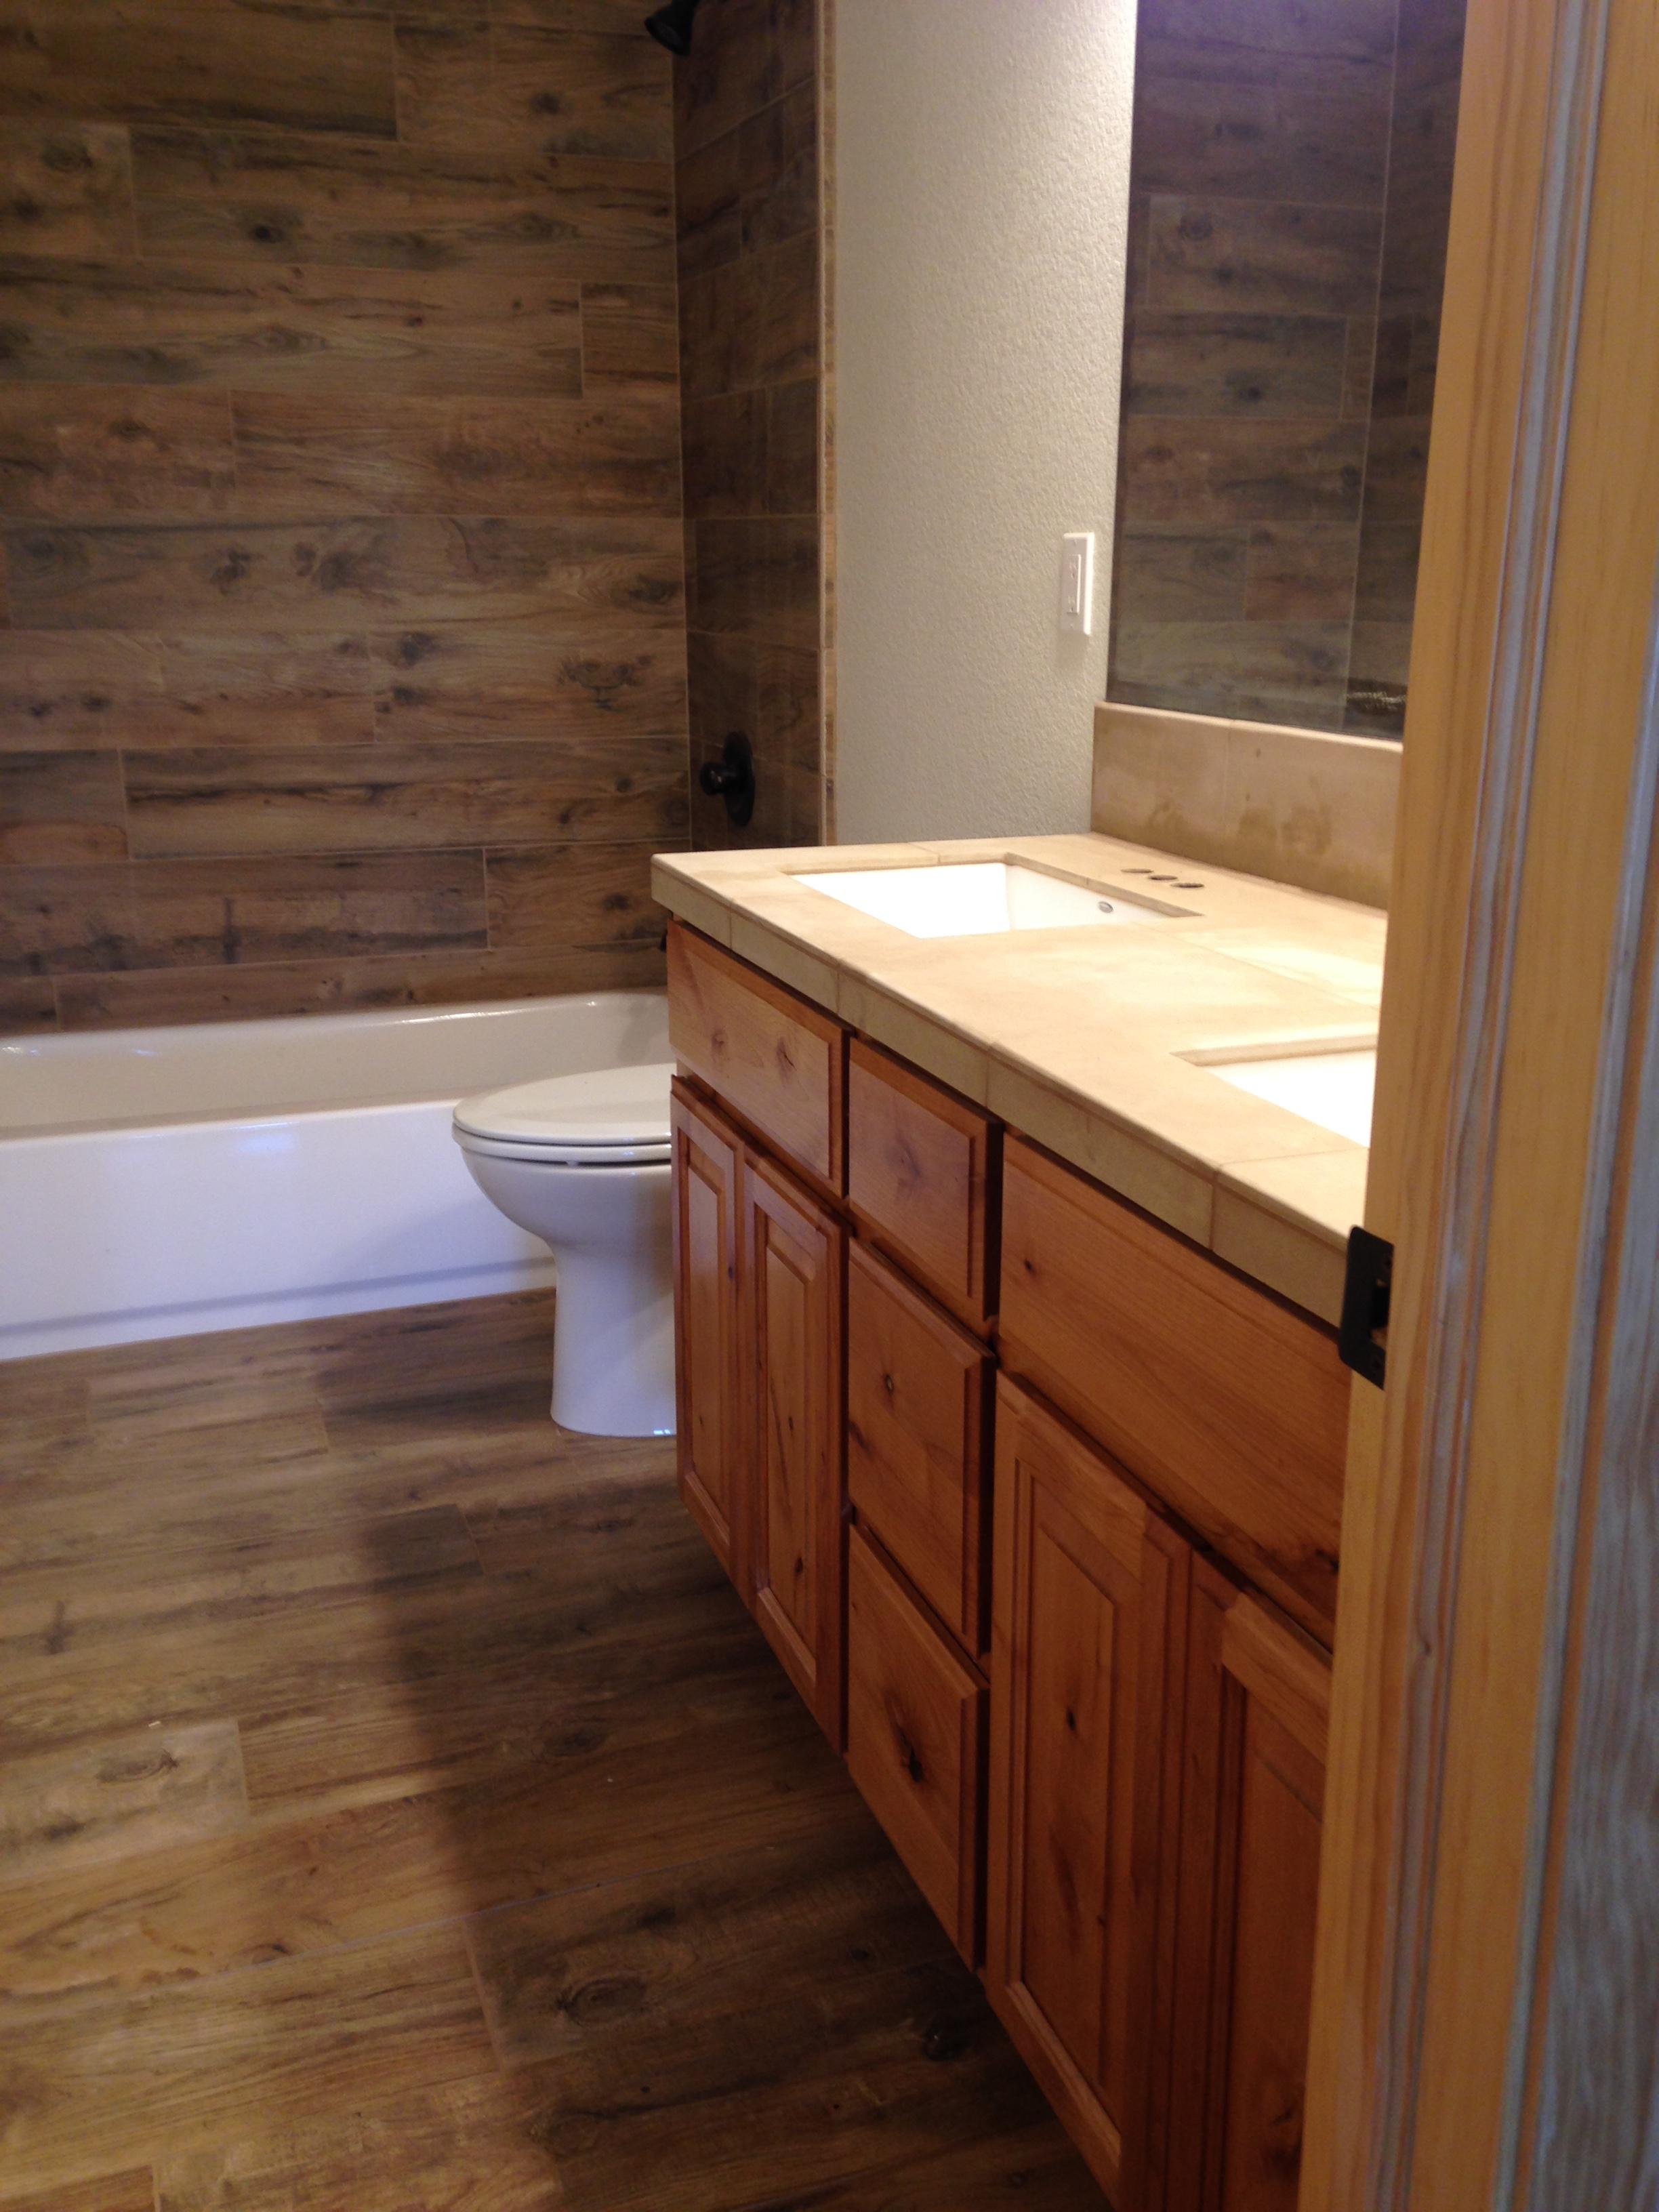 Dubin - Finished Kids Bathroom.JPG